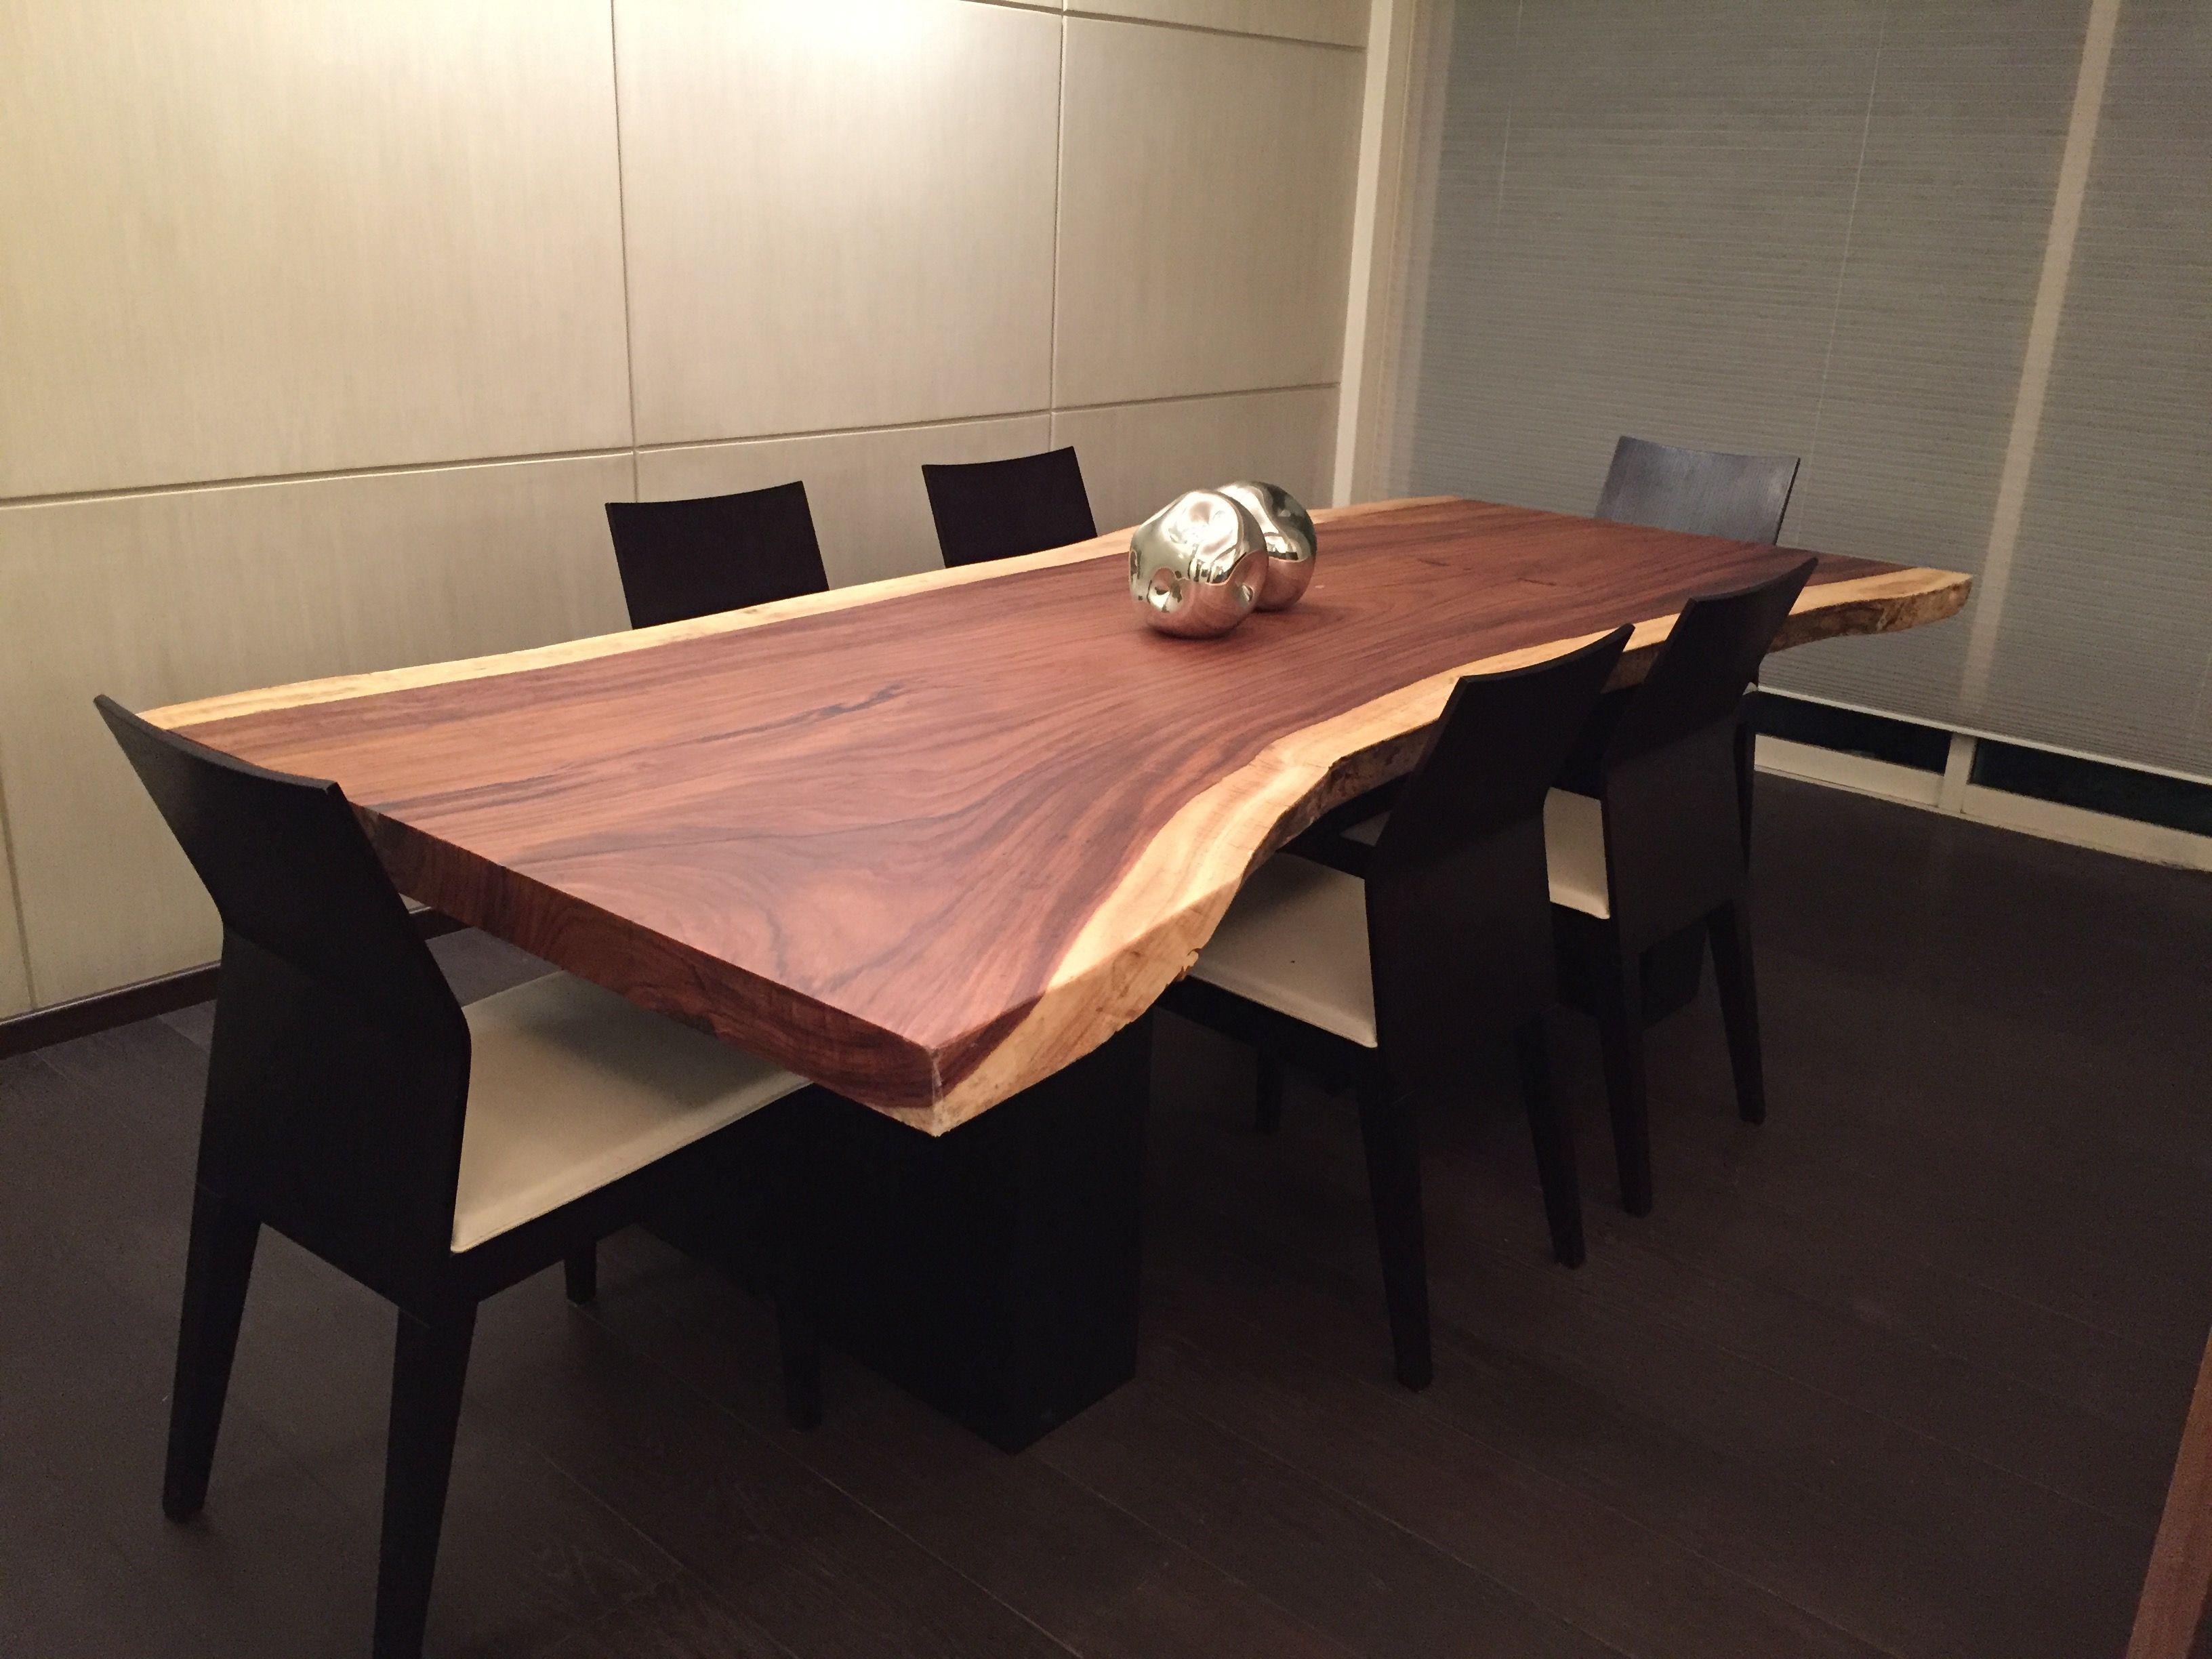 Mesa en madera de parota muebles pinterest madera for Mesas de troncos de arboles